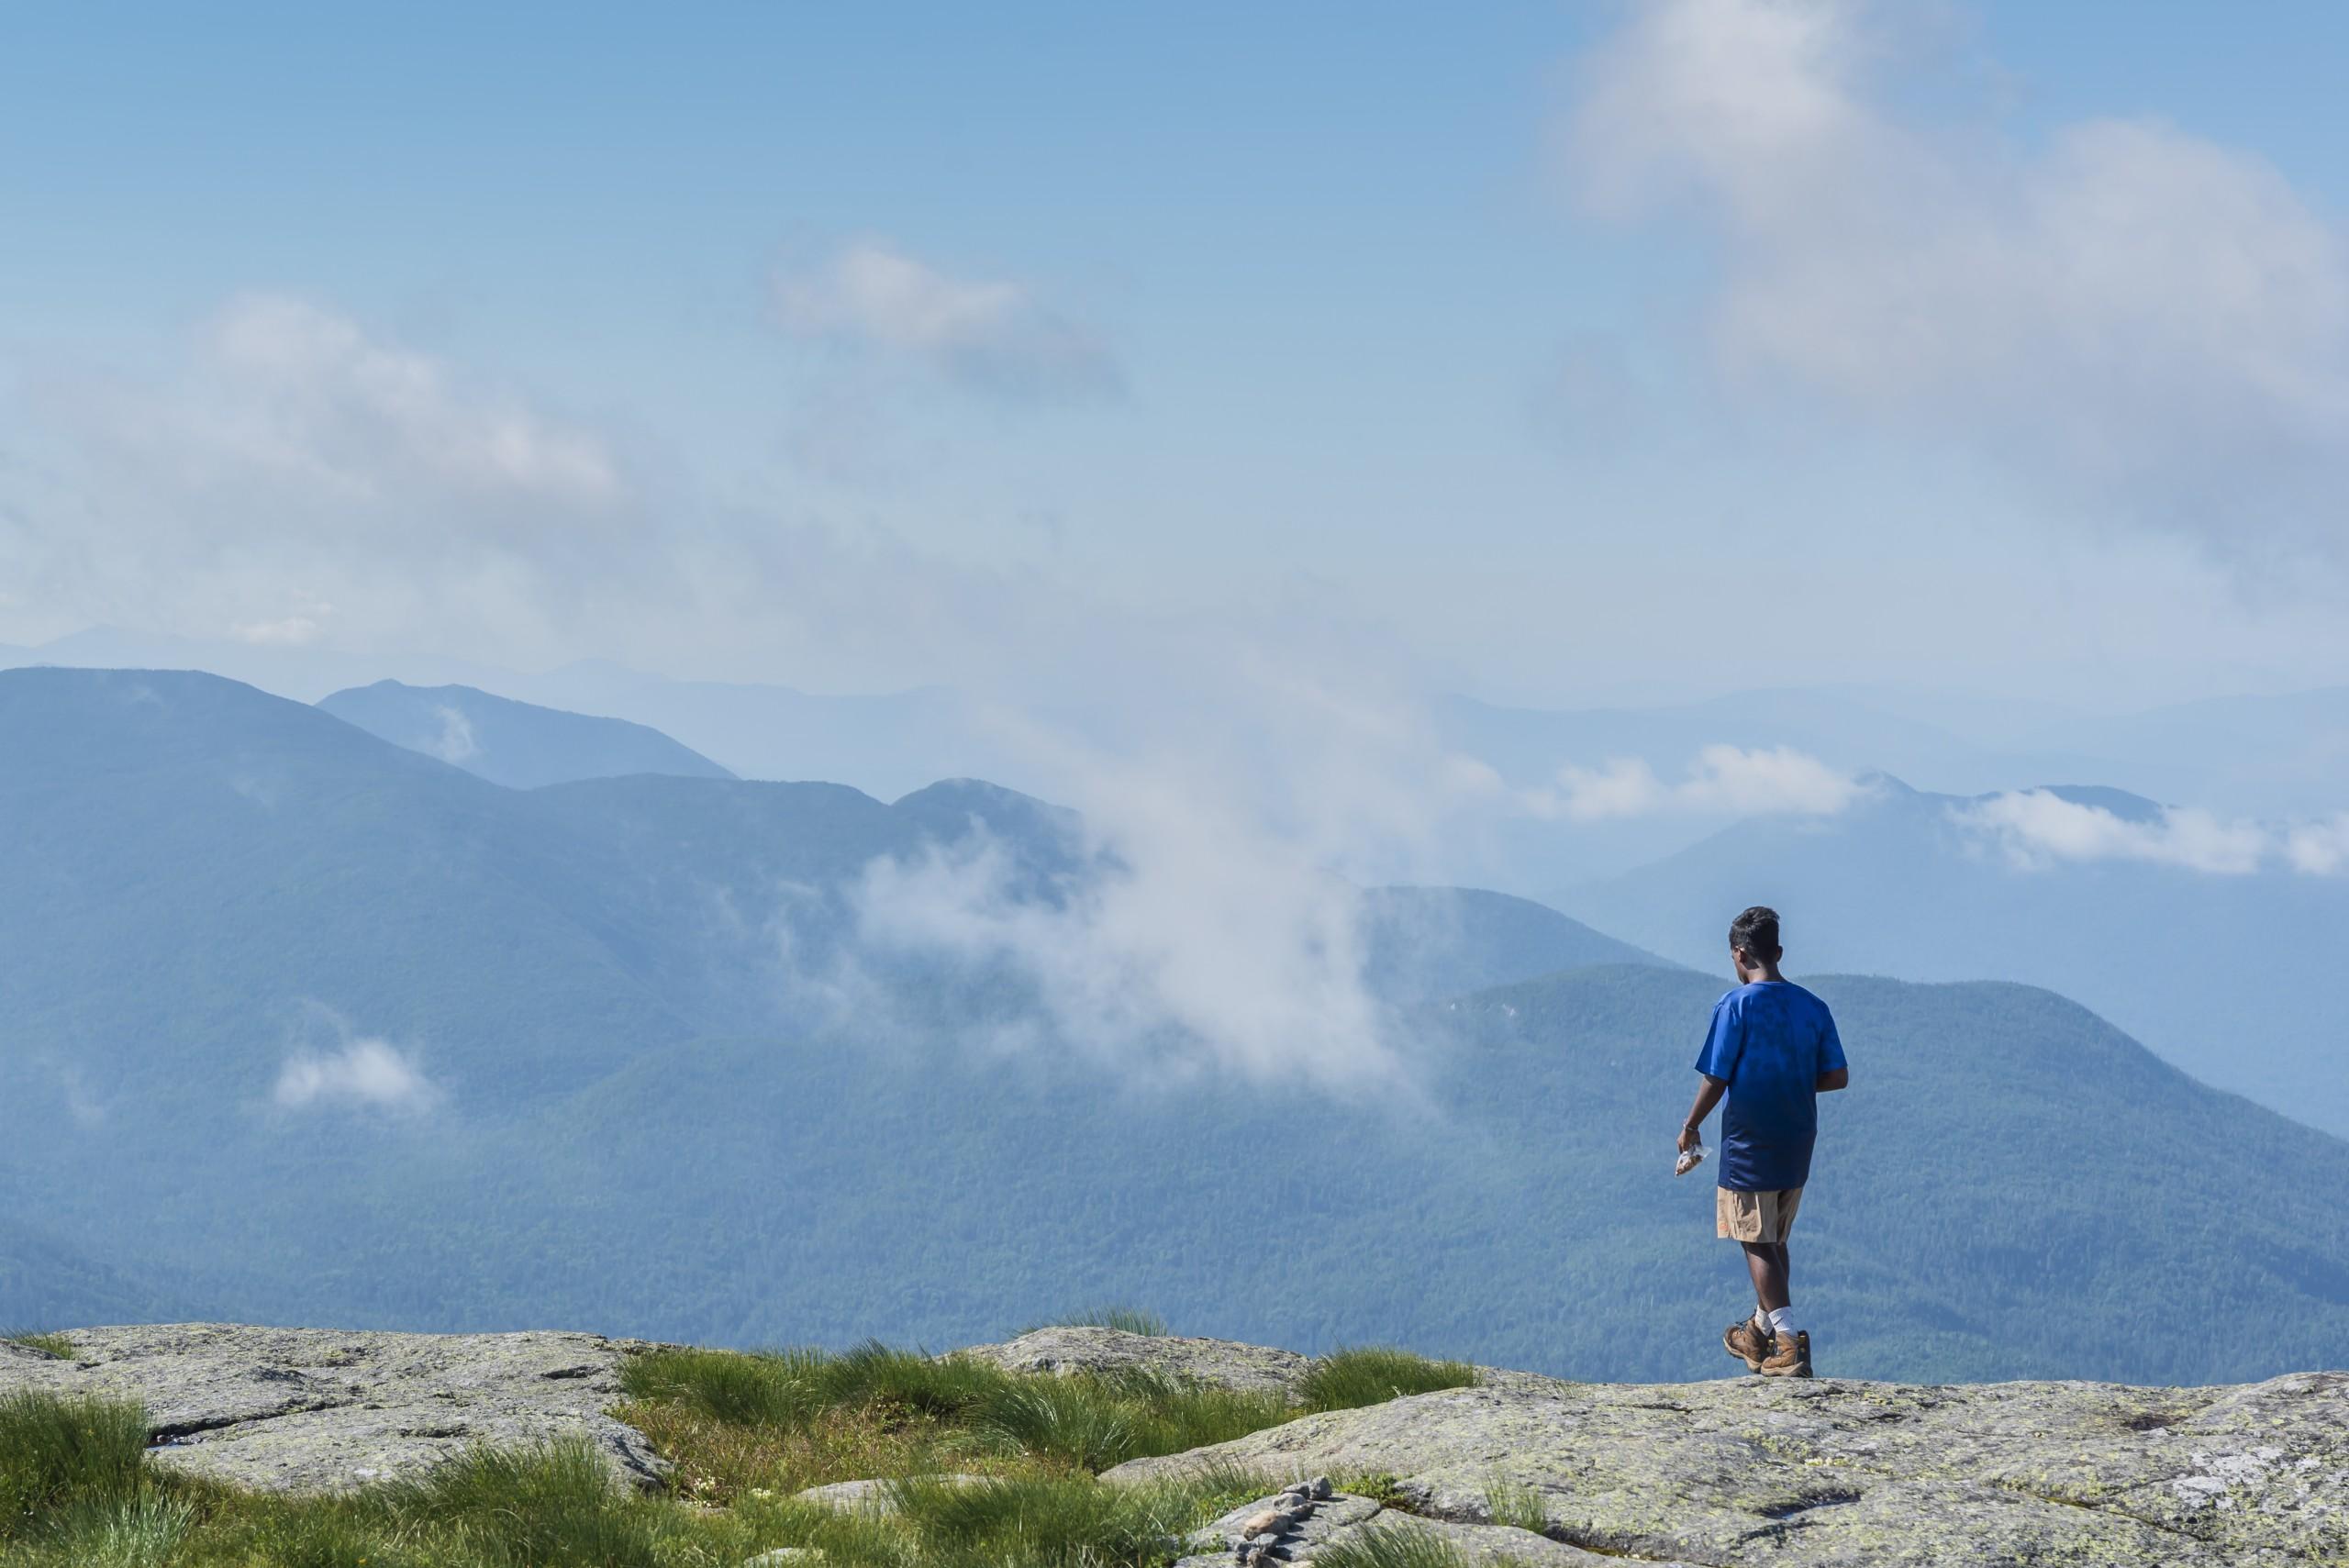 A boy walking on a mountain summit